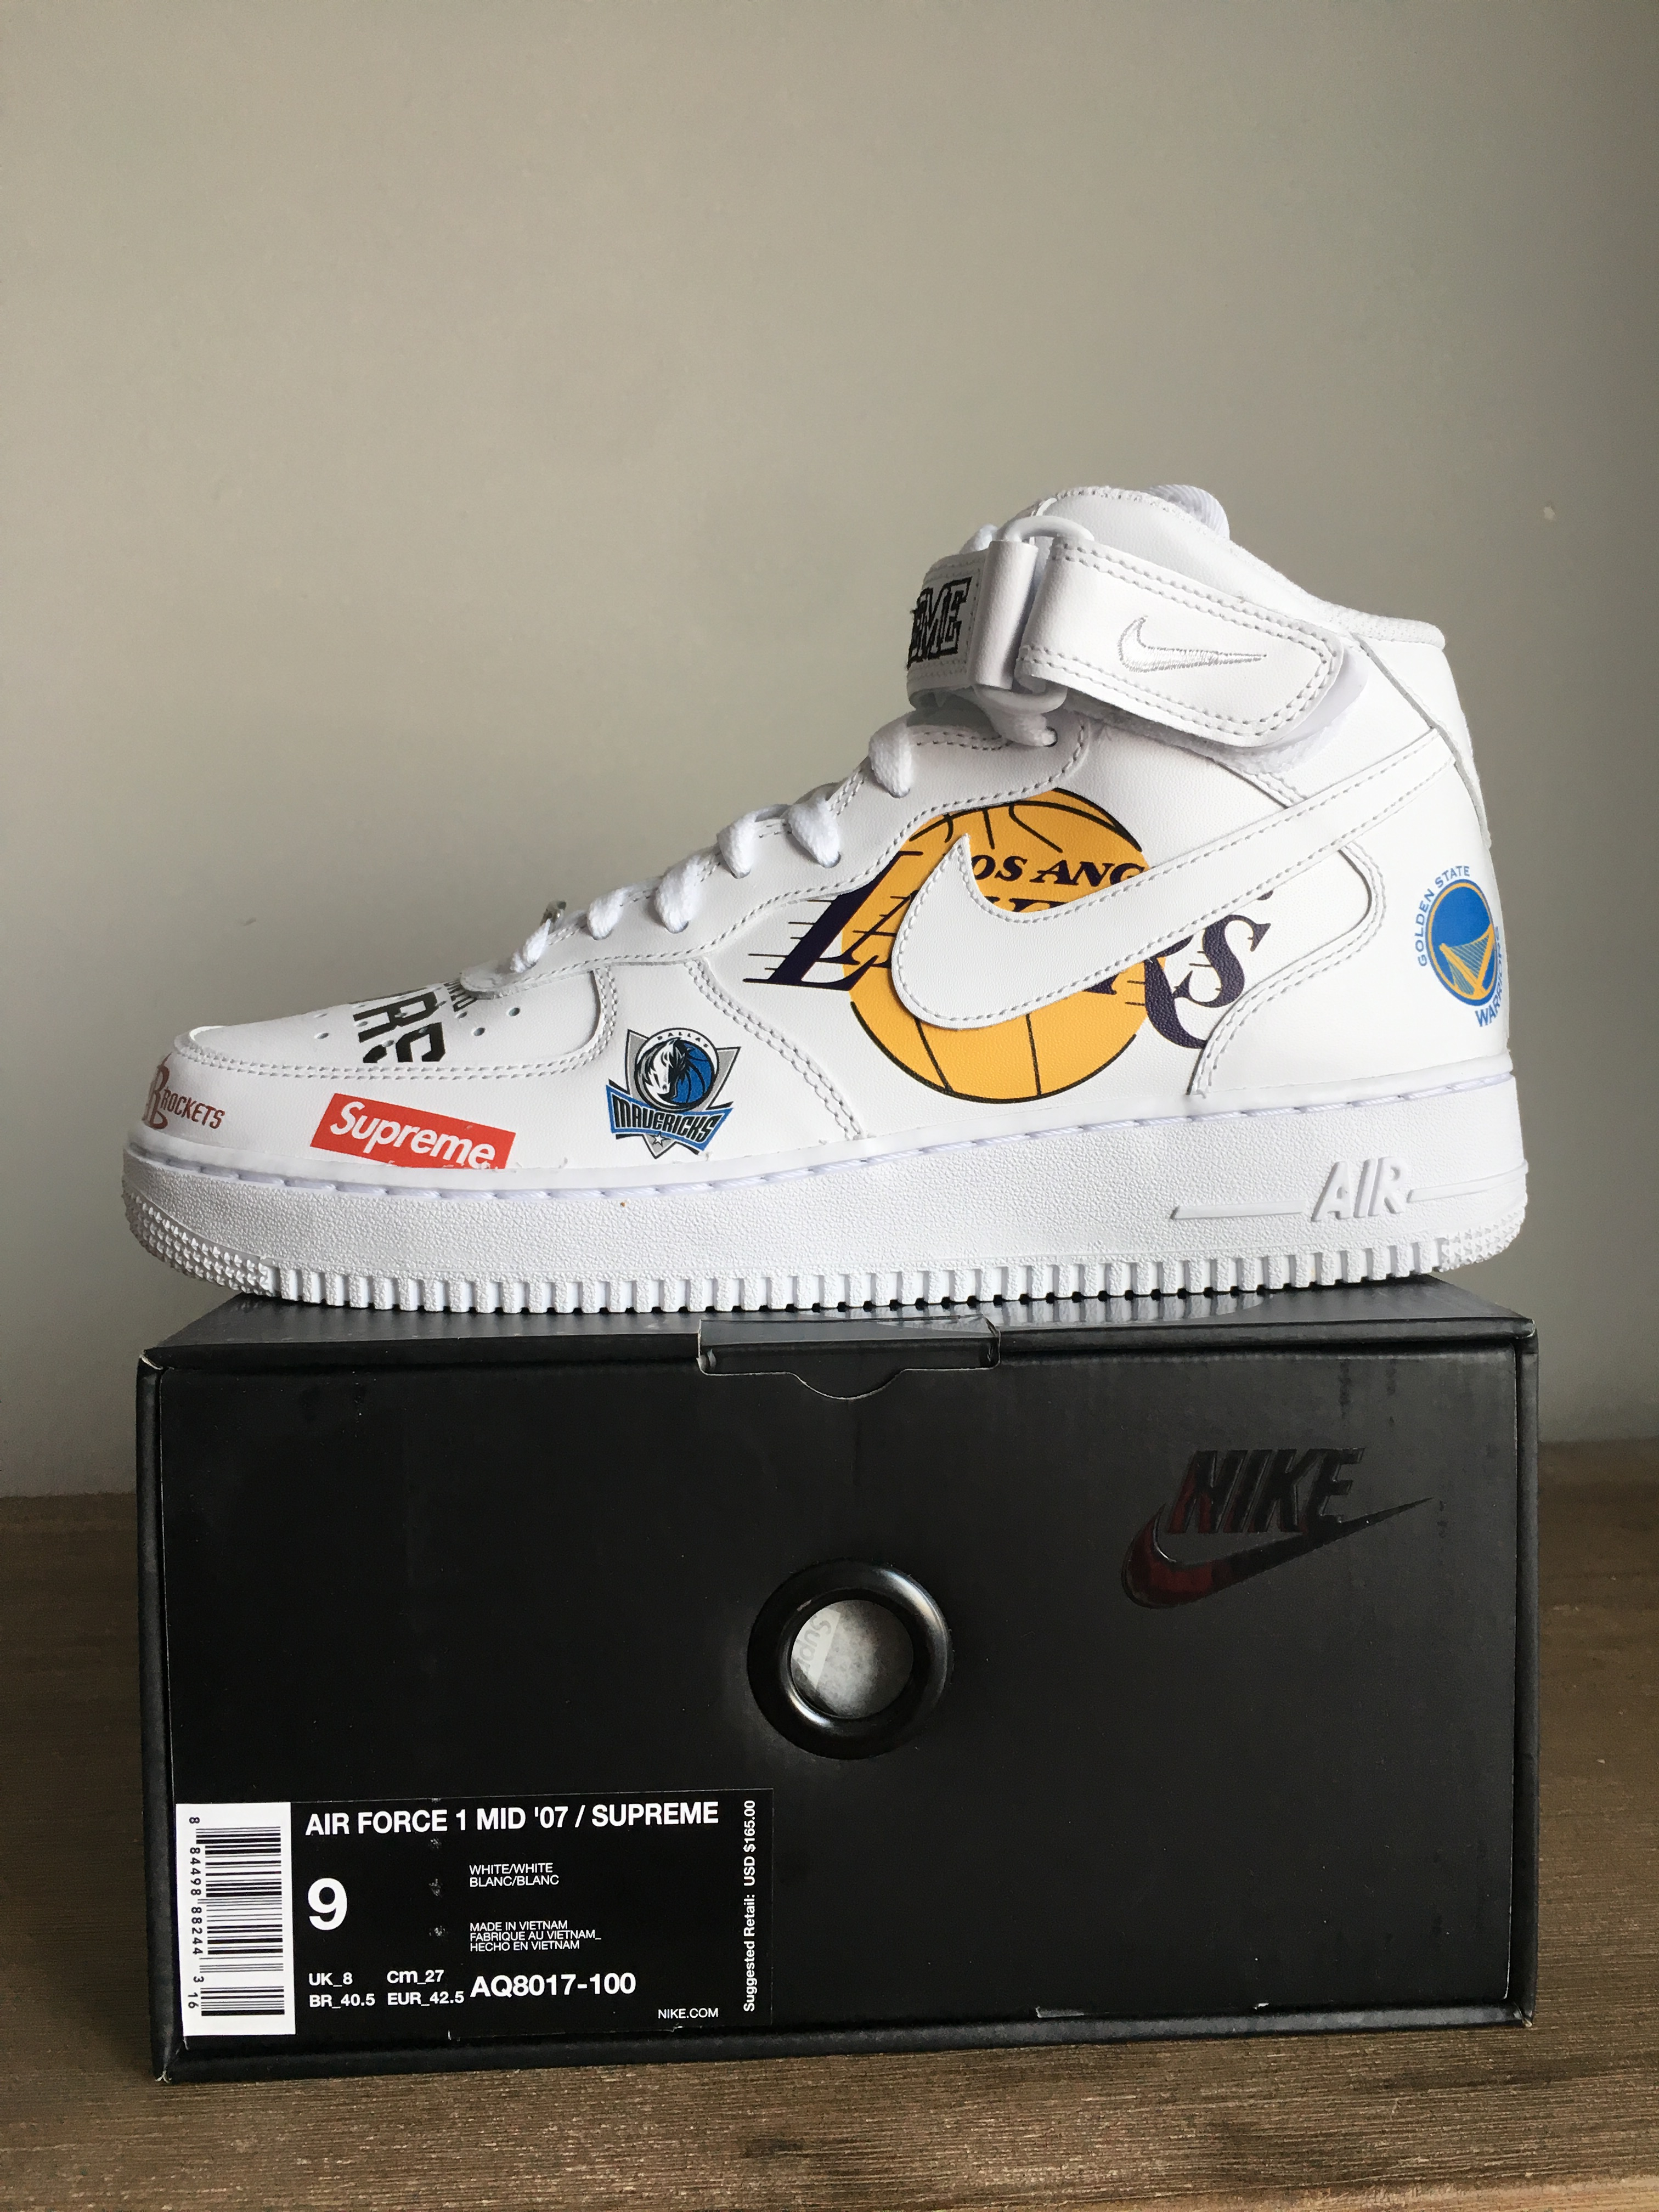 SupremeNike Air Force 1 Mid NBA White